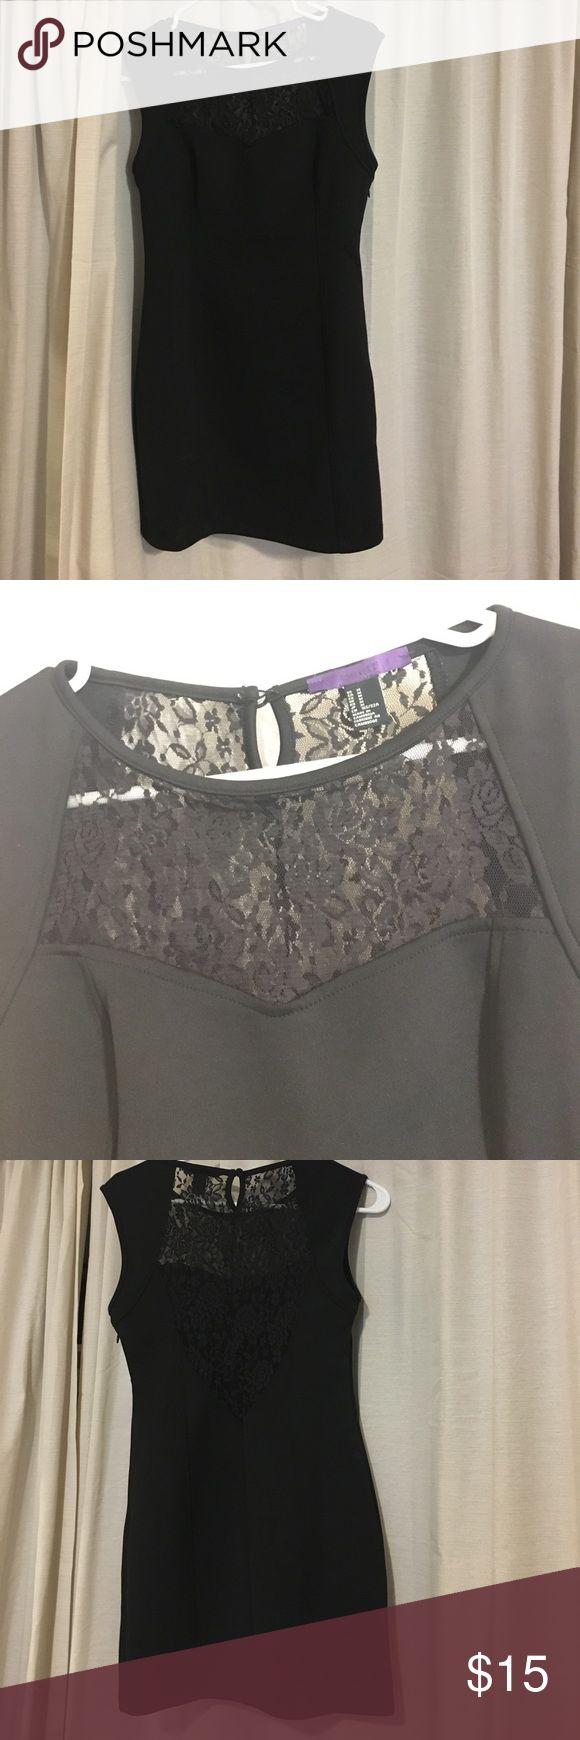 Black dress Black body con dress- doesn't fit super tight Forever 21 Dresses